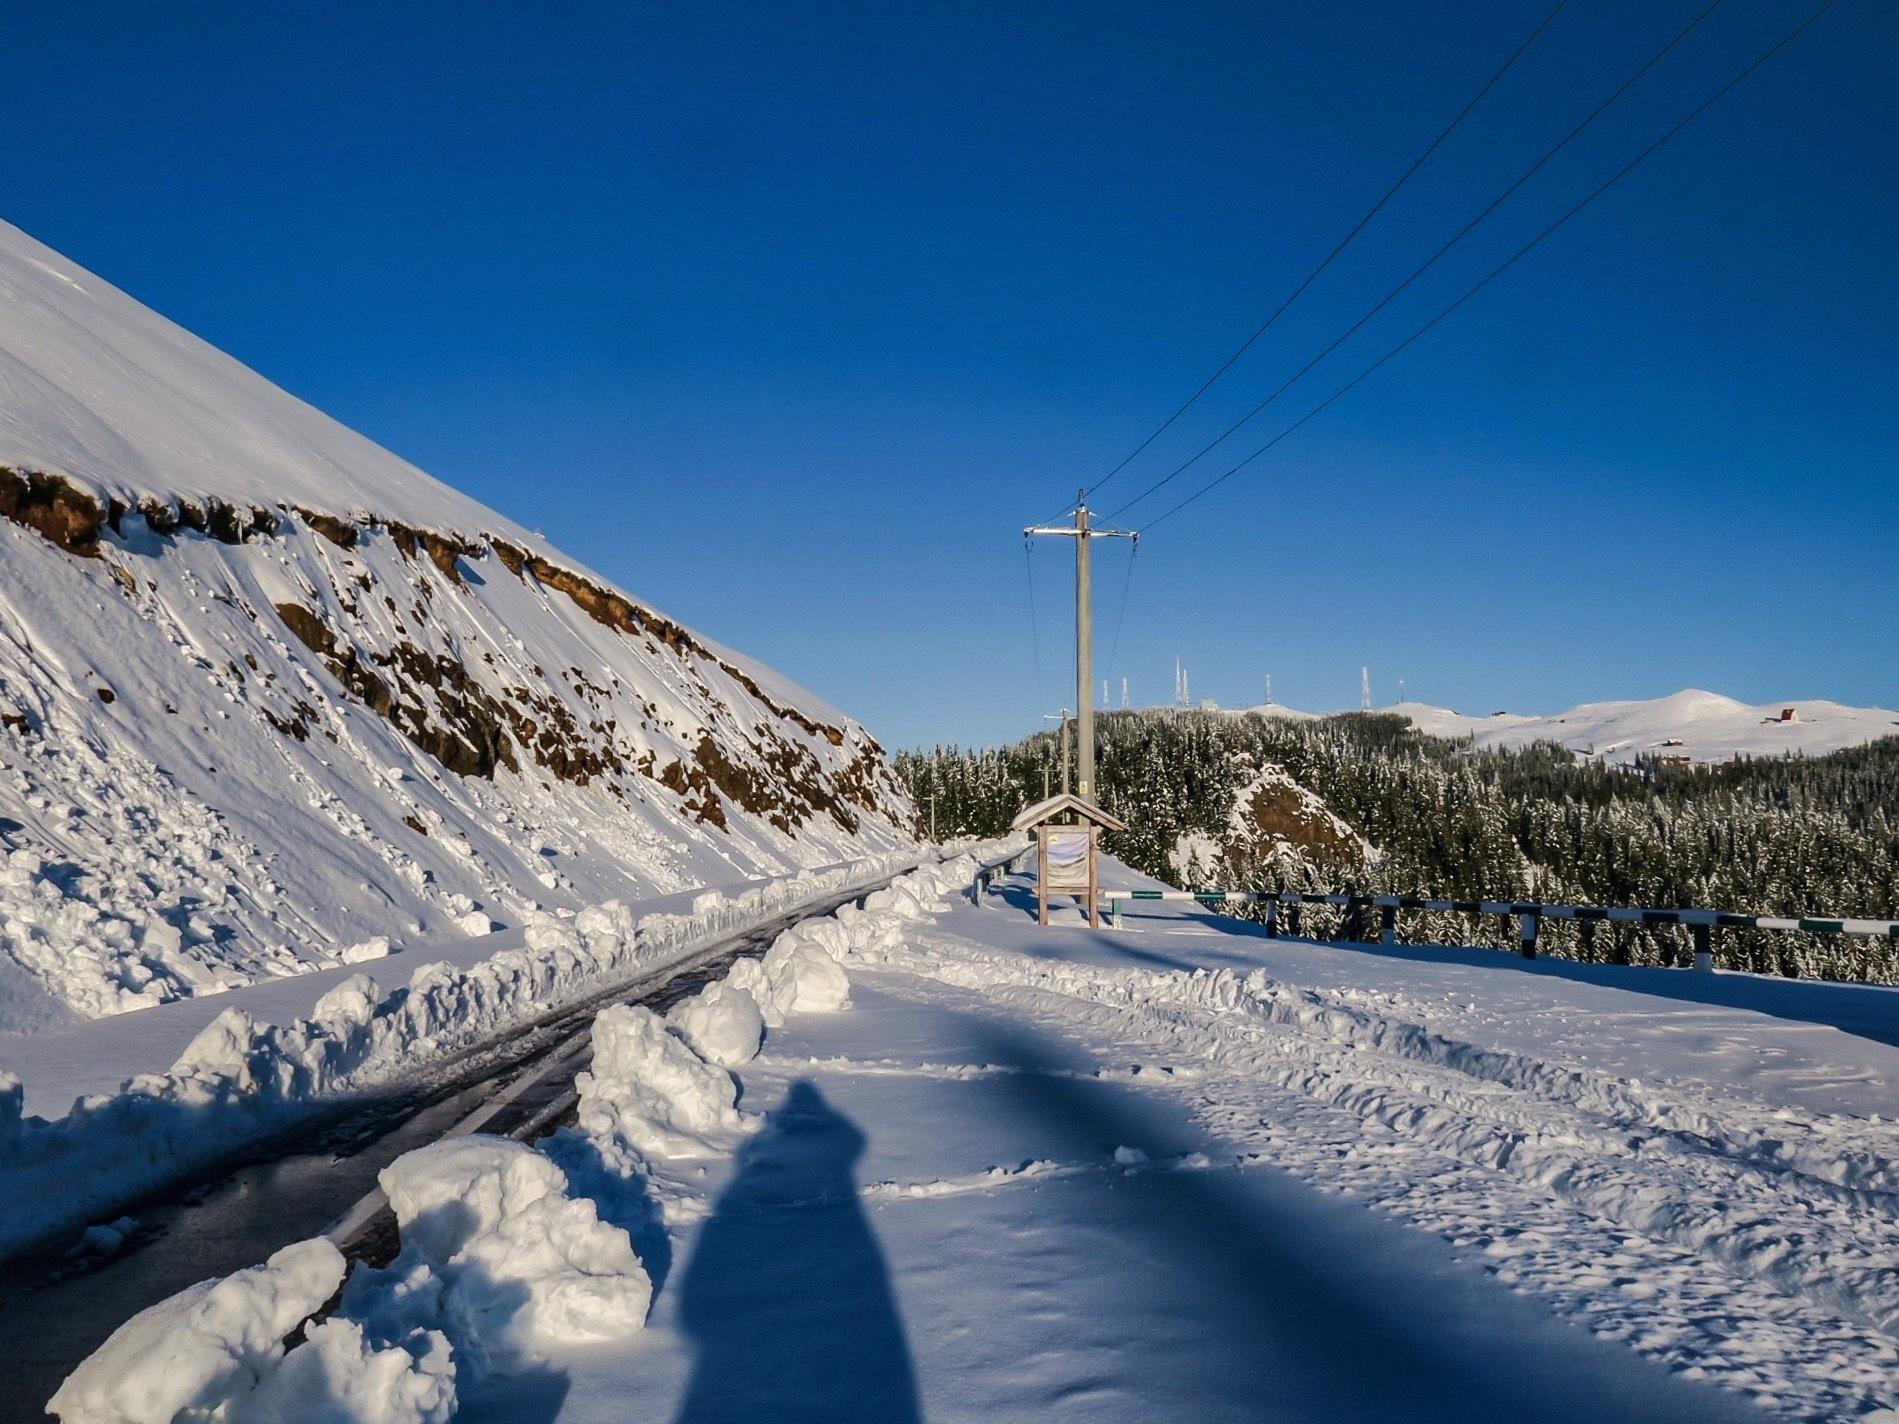 Road to the top by Adi Gli